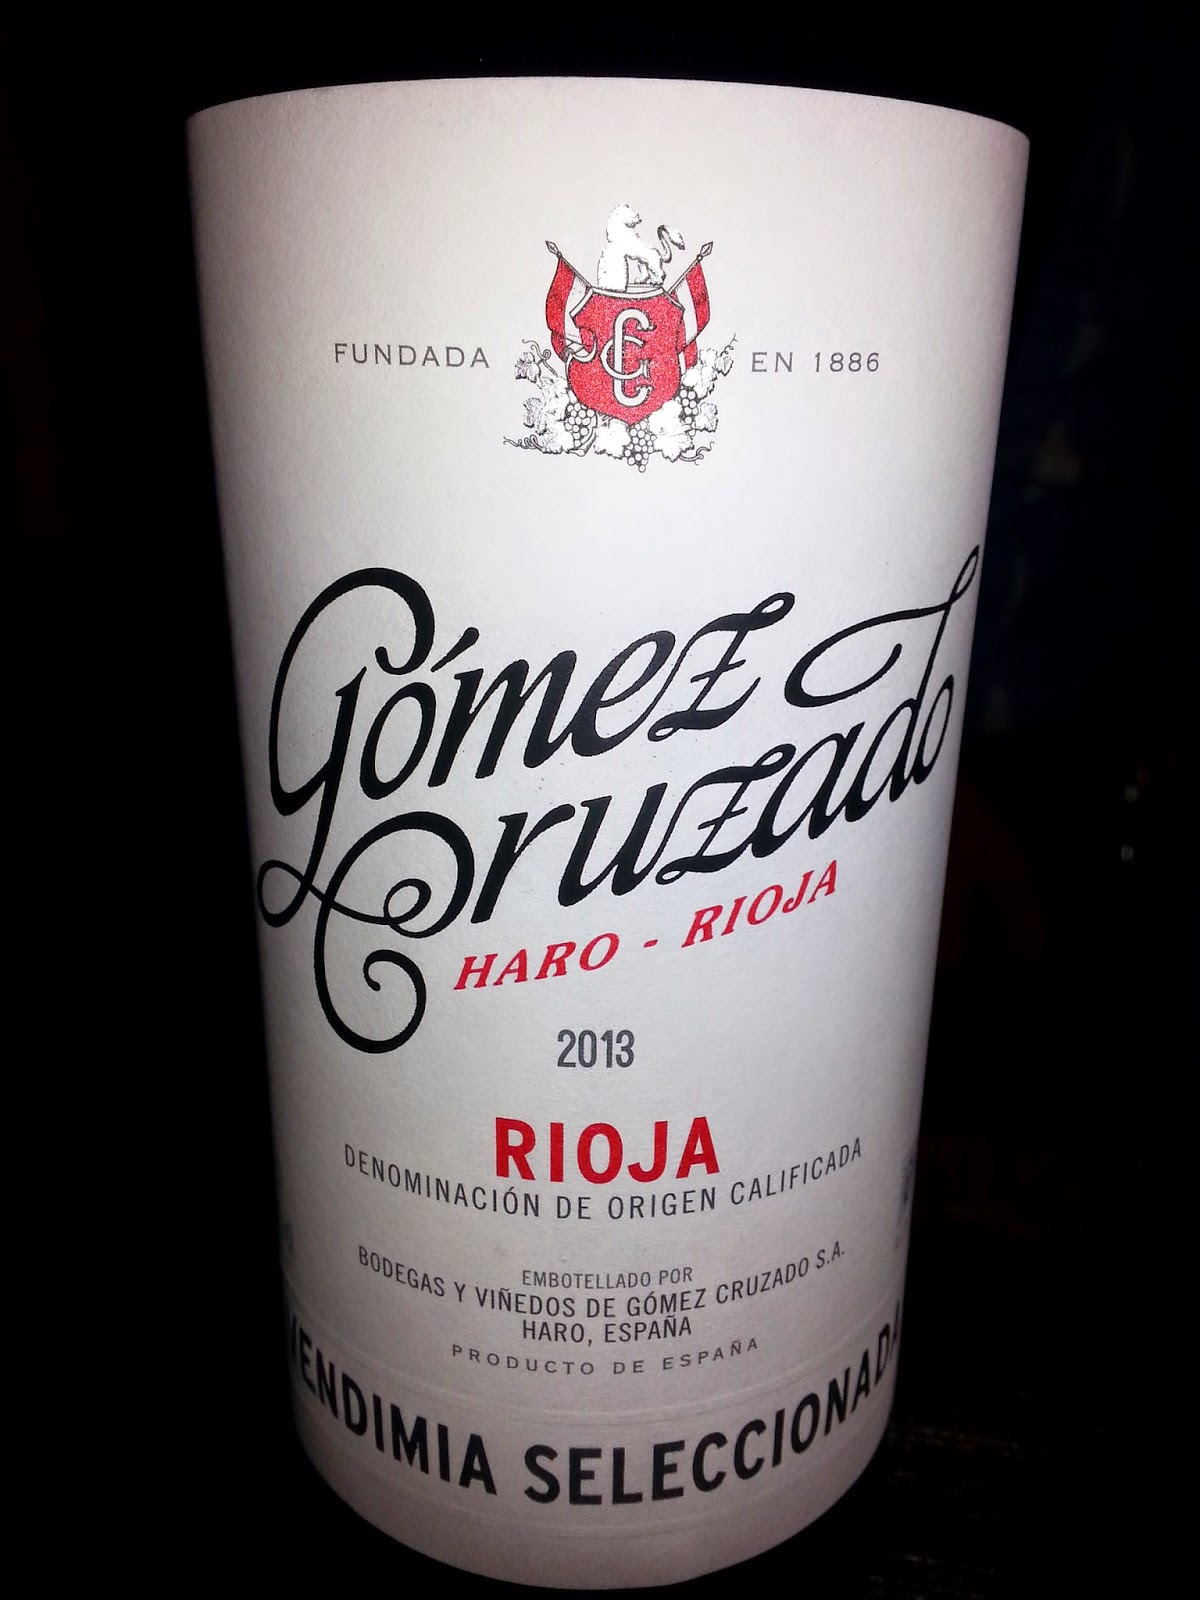 GOMEZ CRUZADO VENDIMIA SELECCIONADA 2013, D.o.c Rioja